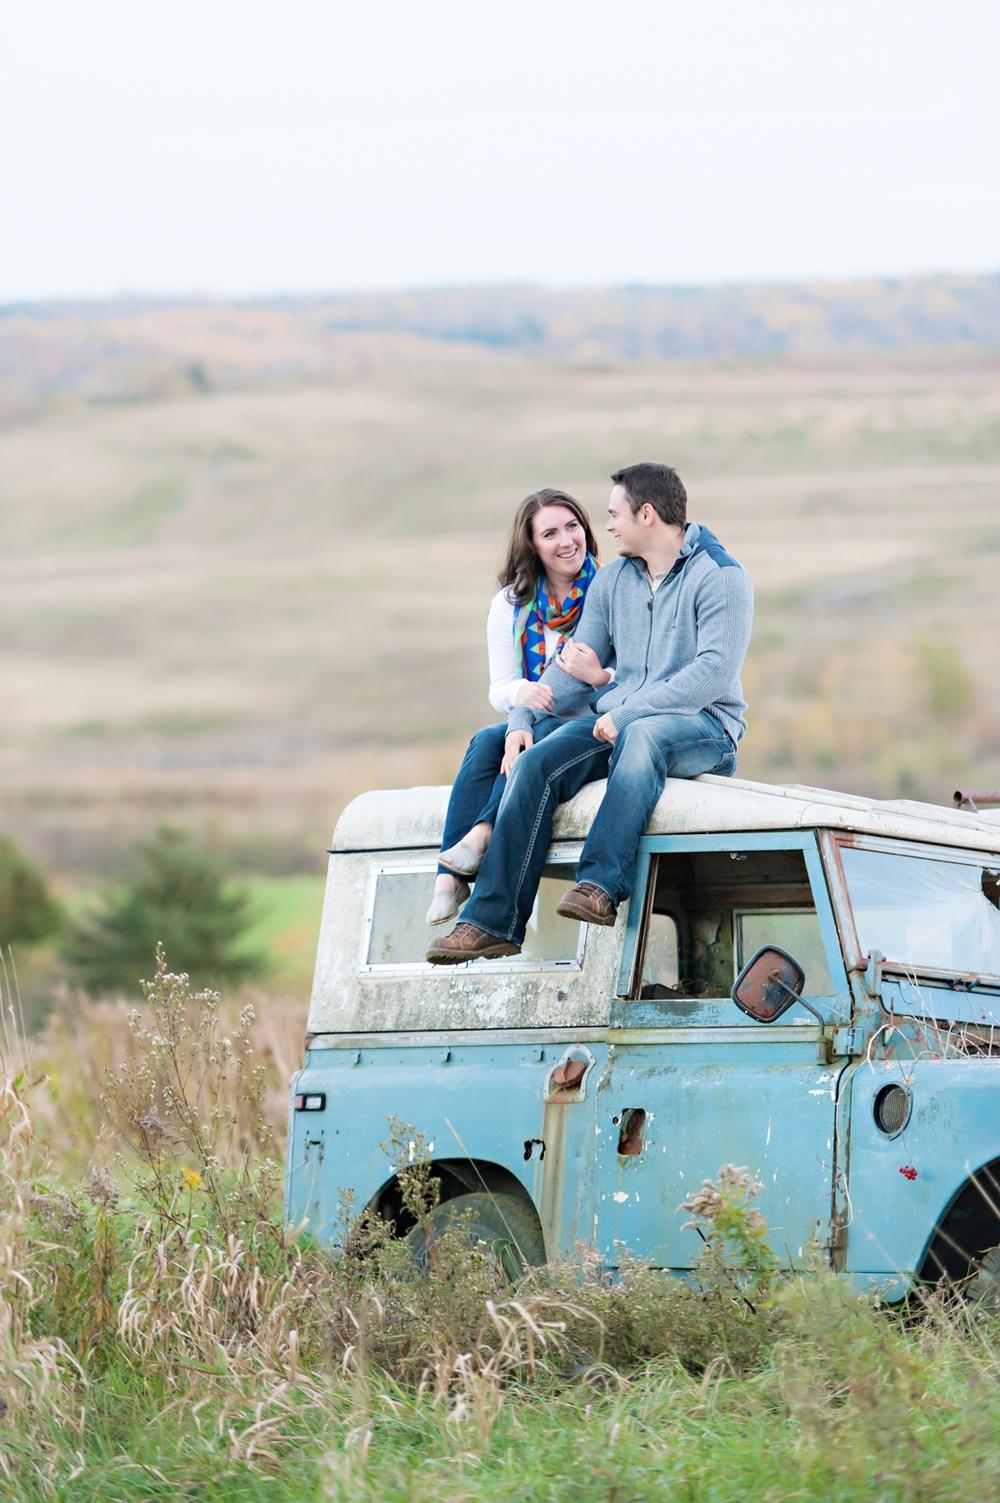 Abandoned-Farm-Engagement-Halifax-Engagment-Fall-Engagement-Photos087.jpg